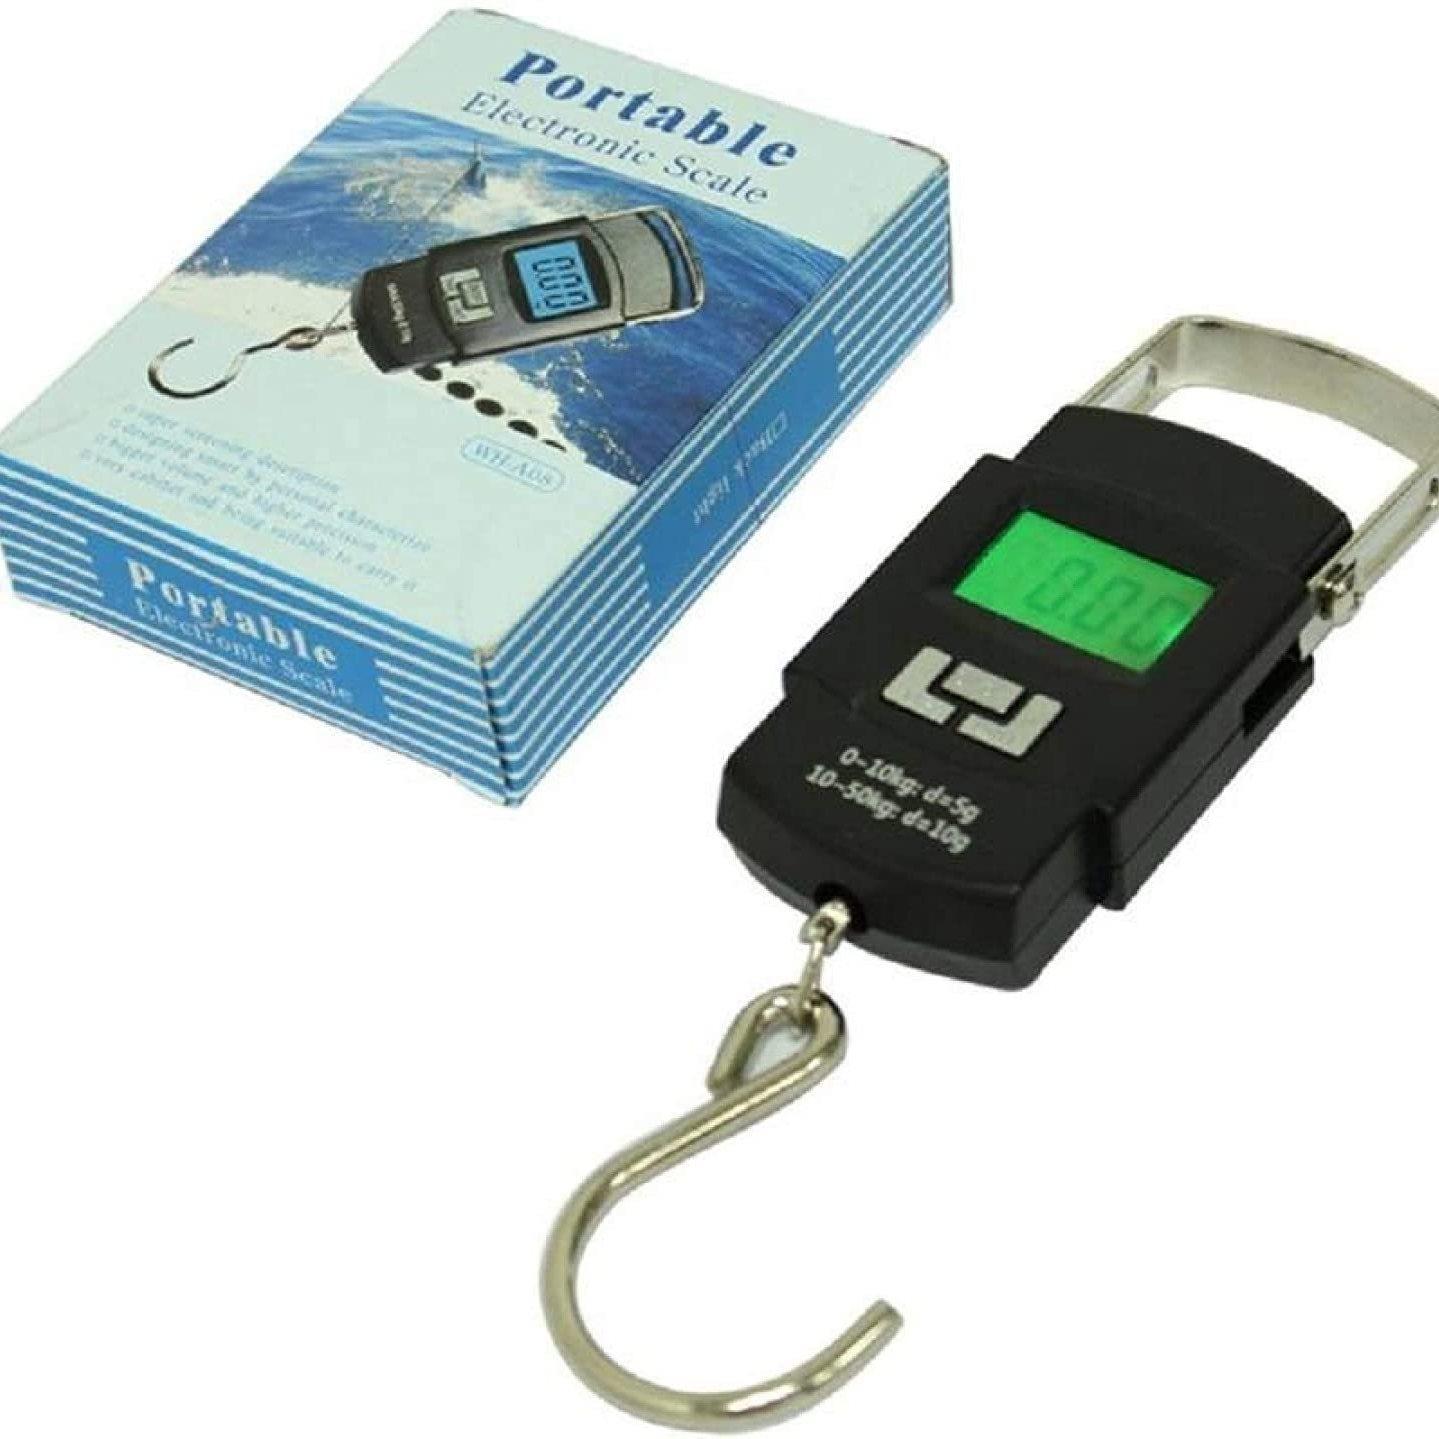 Digital Portable Hook Type Weighing Scale 50 kg, Multicolor